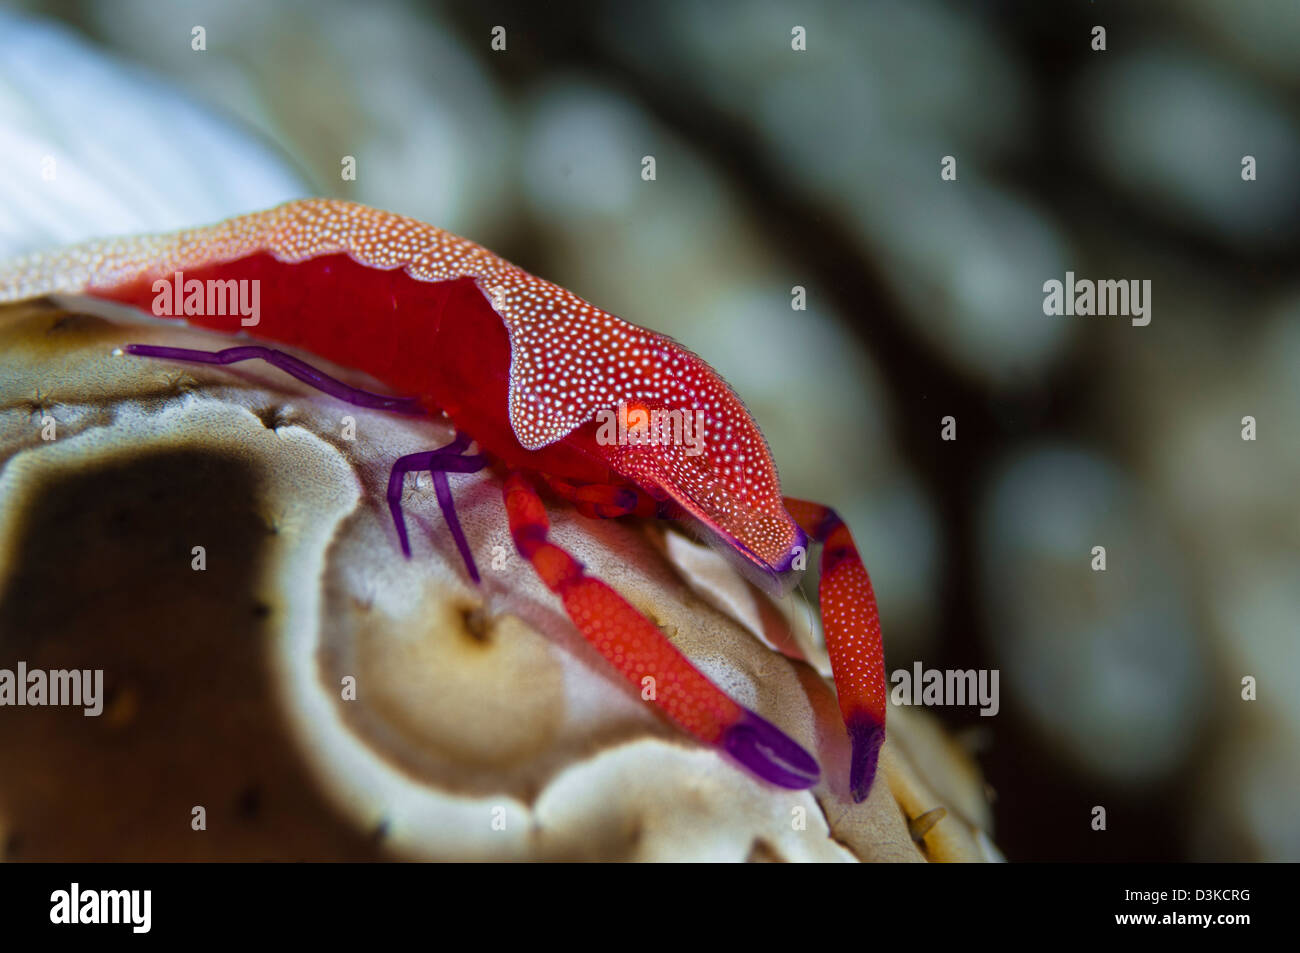 Imperator Commensal Shrimp (Periclimenes imperator) on Eyed Sea Cucumber (Bohadschia argus), Fiji. - Stock Image